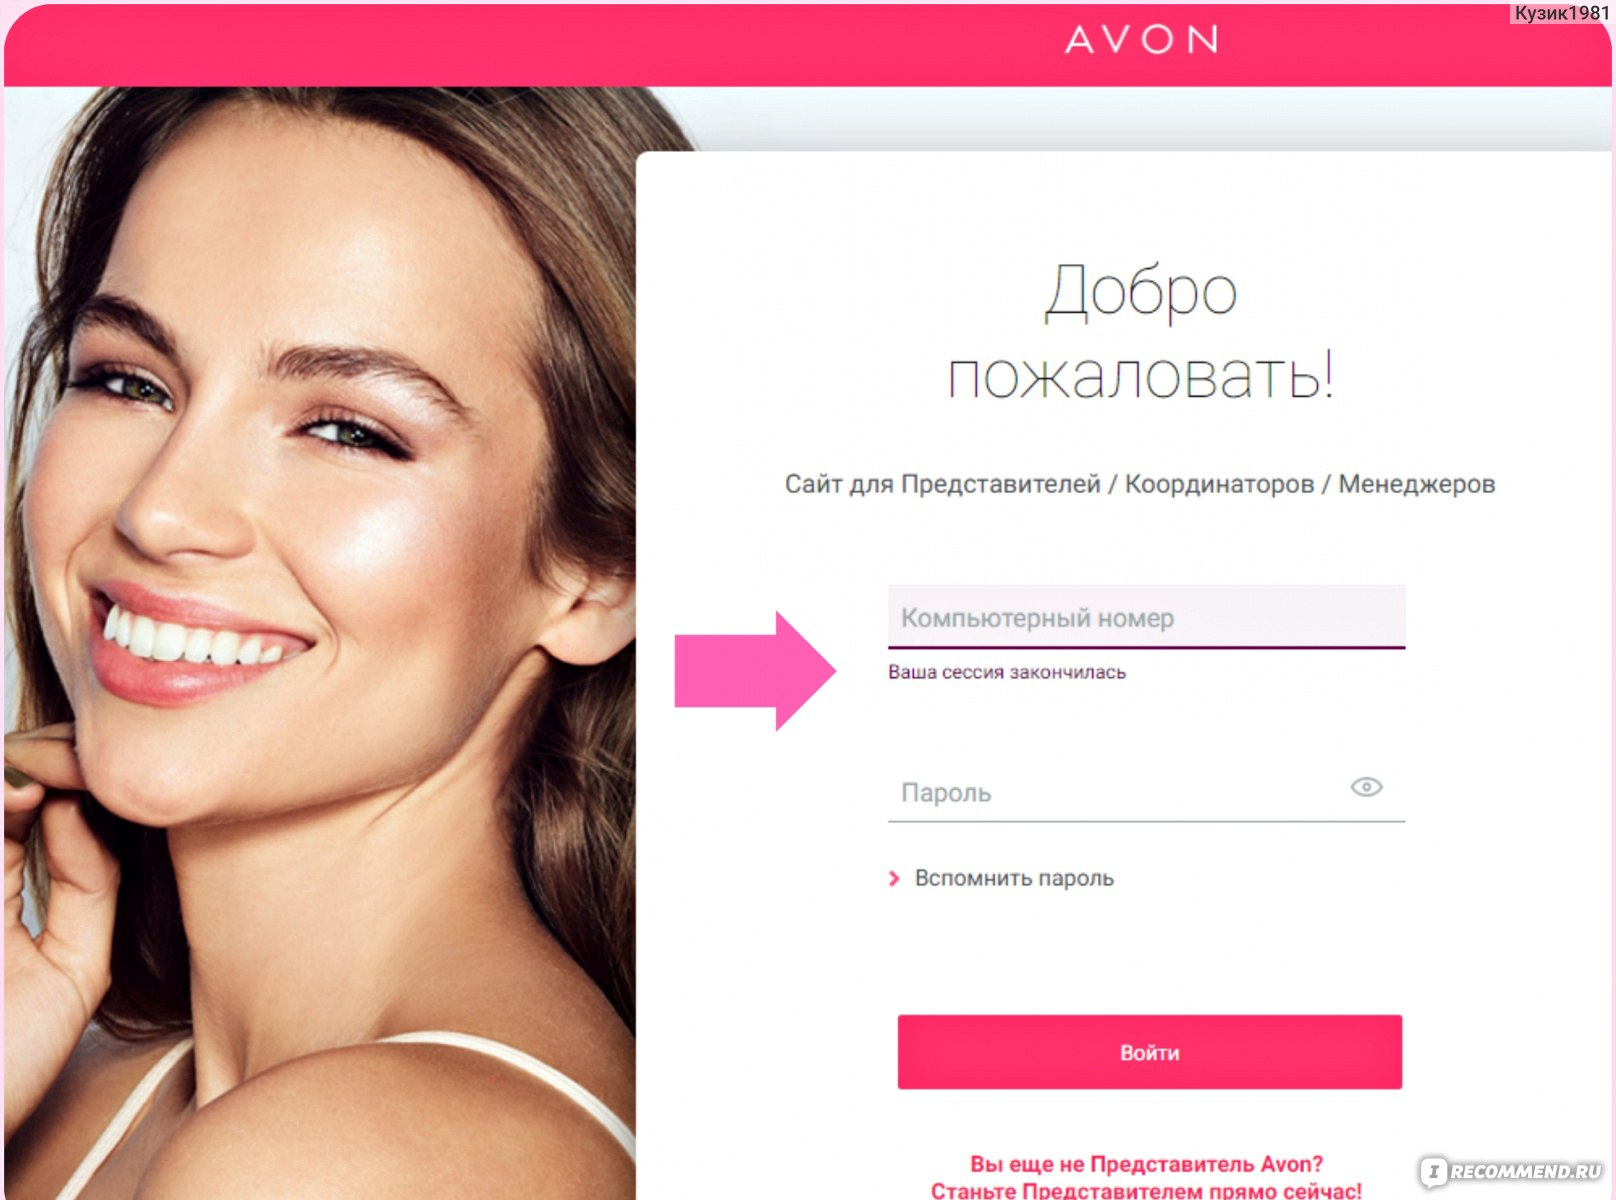 Www avon ru представителям разместить заказ касмара косметика купить в испании